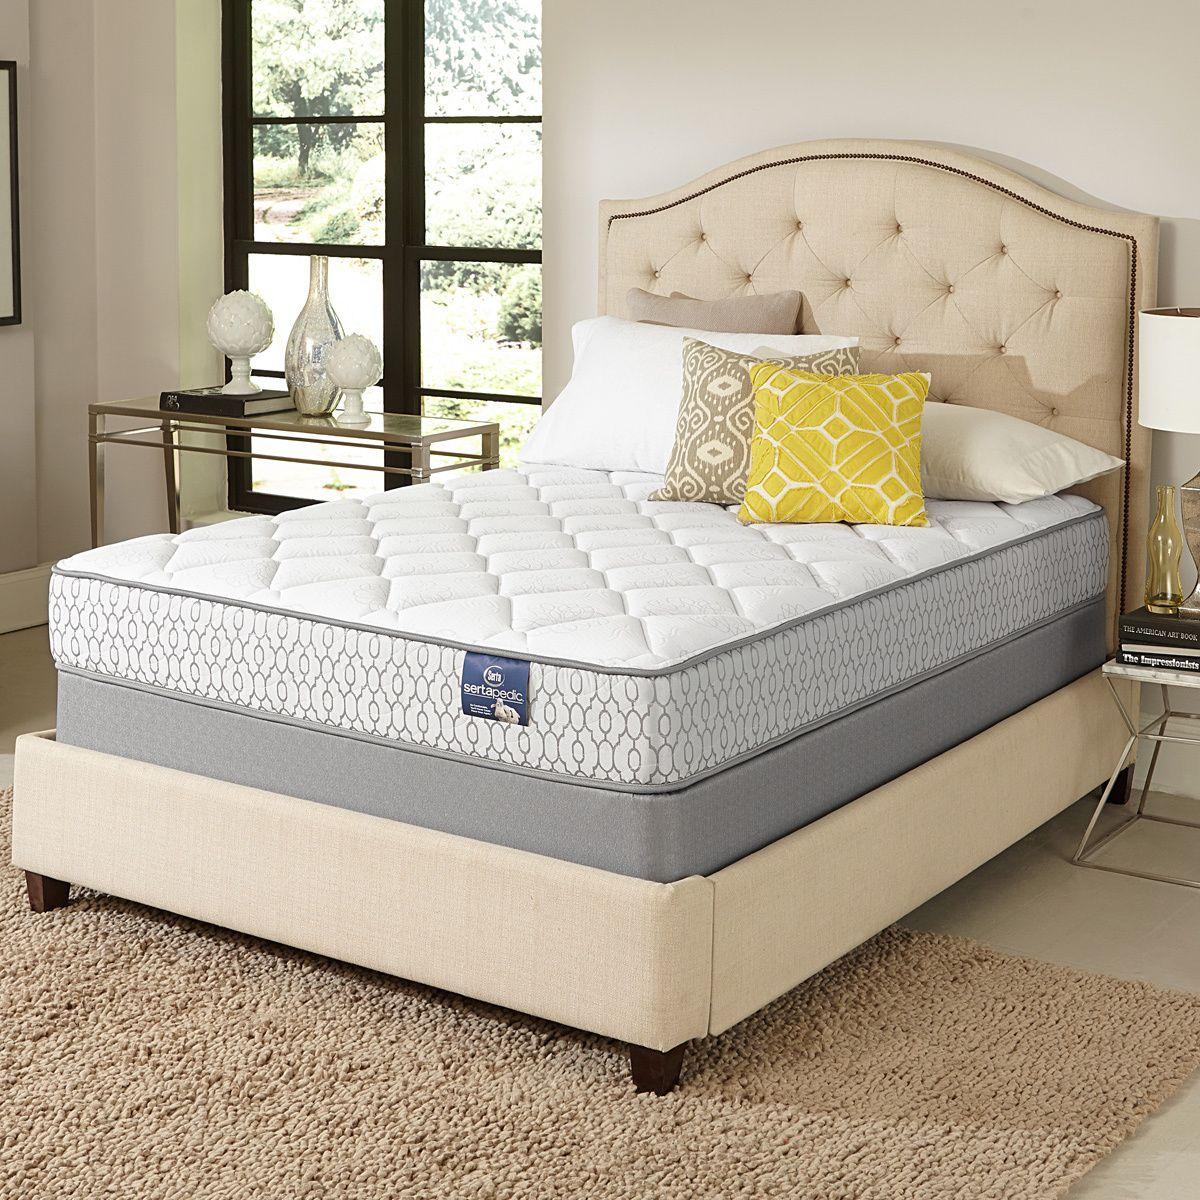 serta amazement plush queen size mattress set by serta mattress